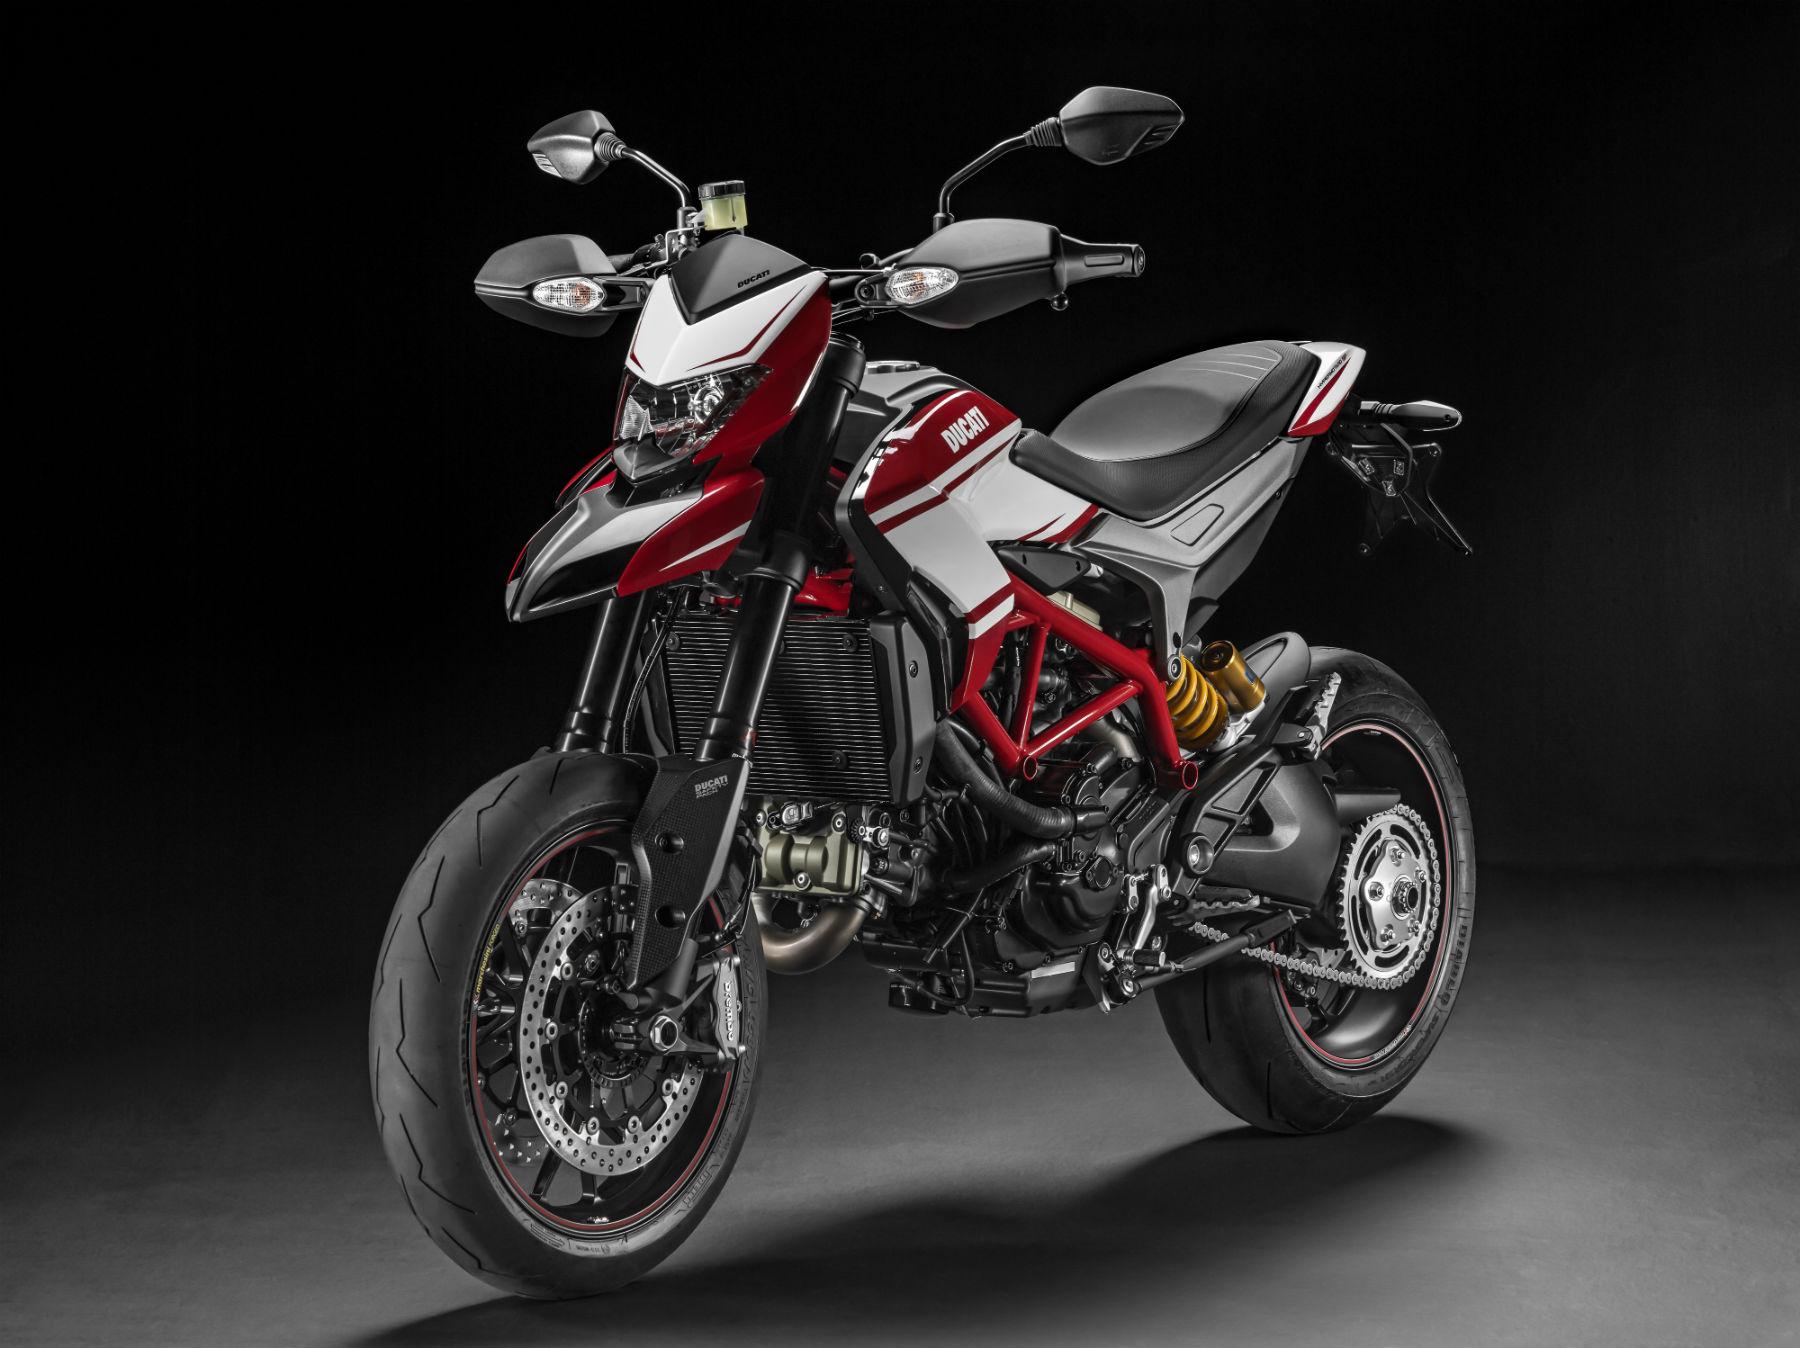 New colour scheme for Ducati Hypermotard SP